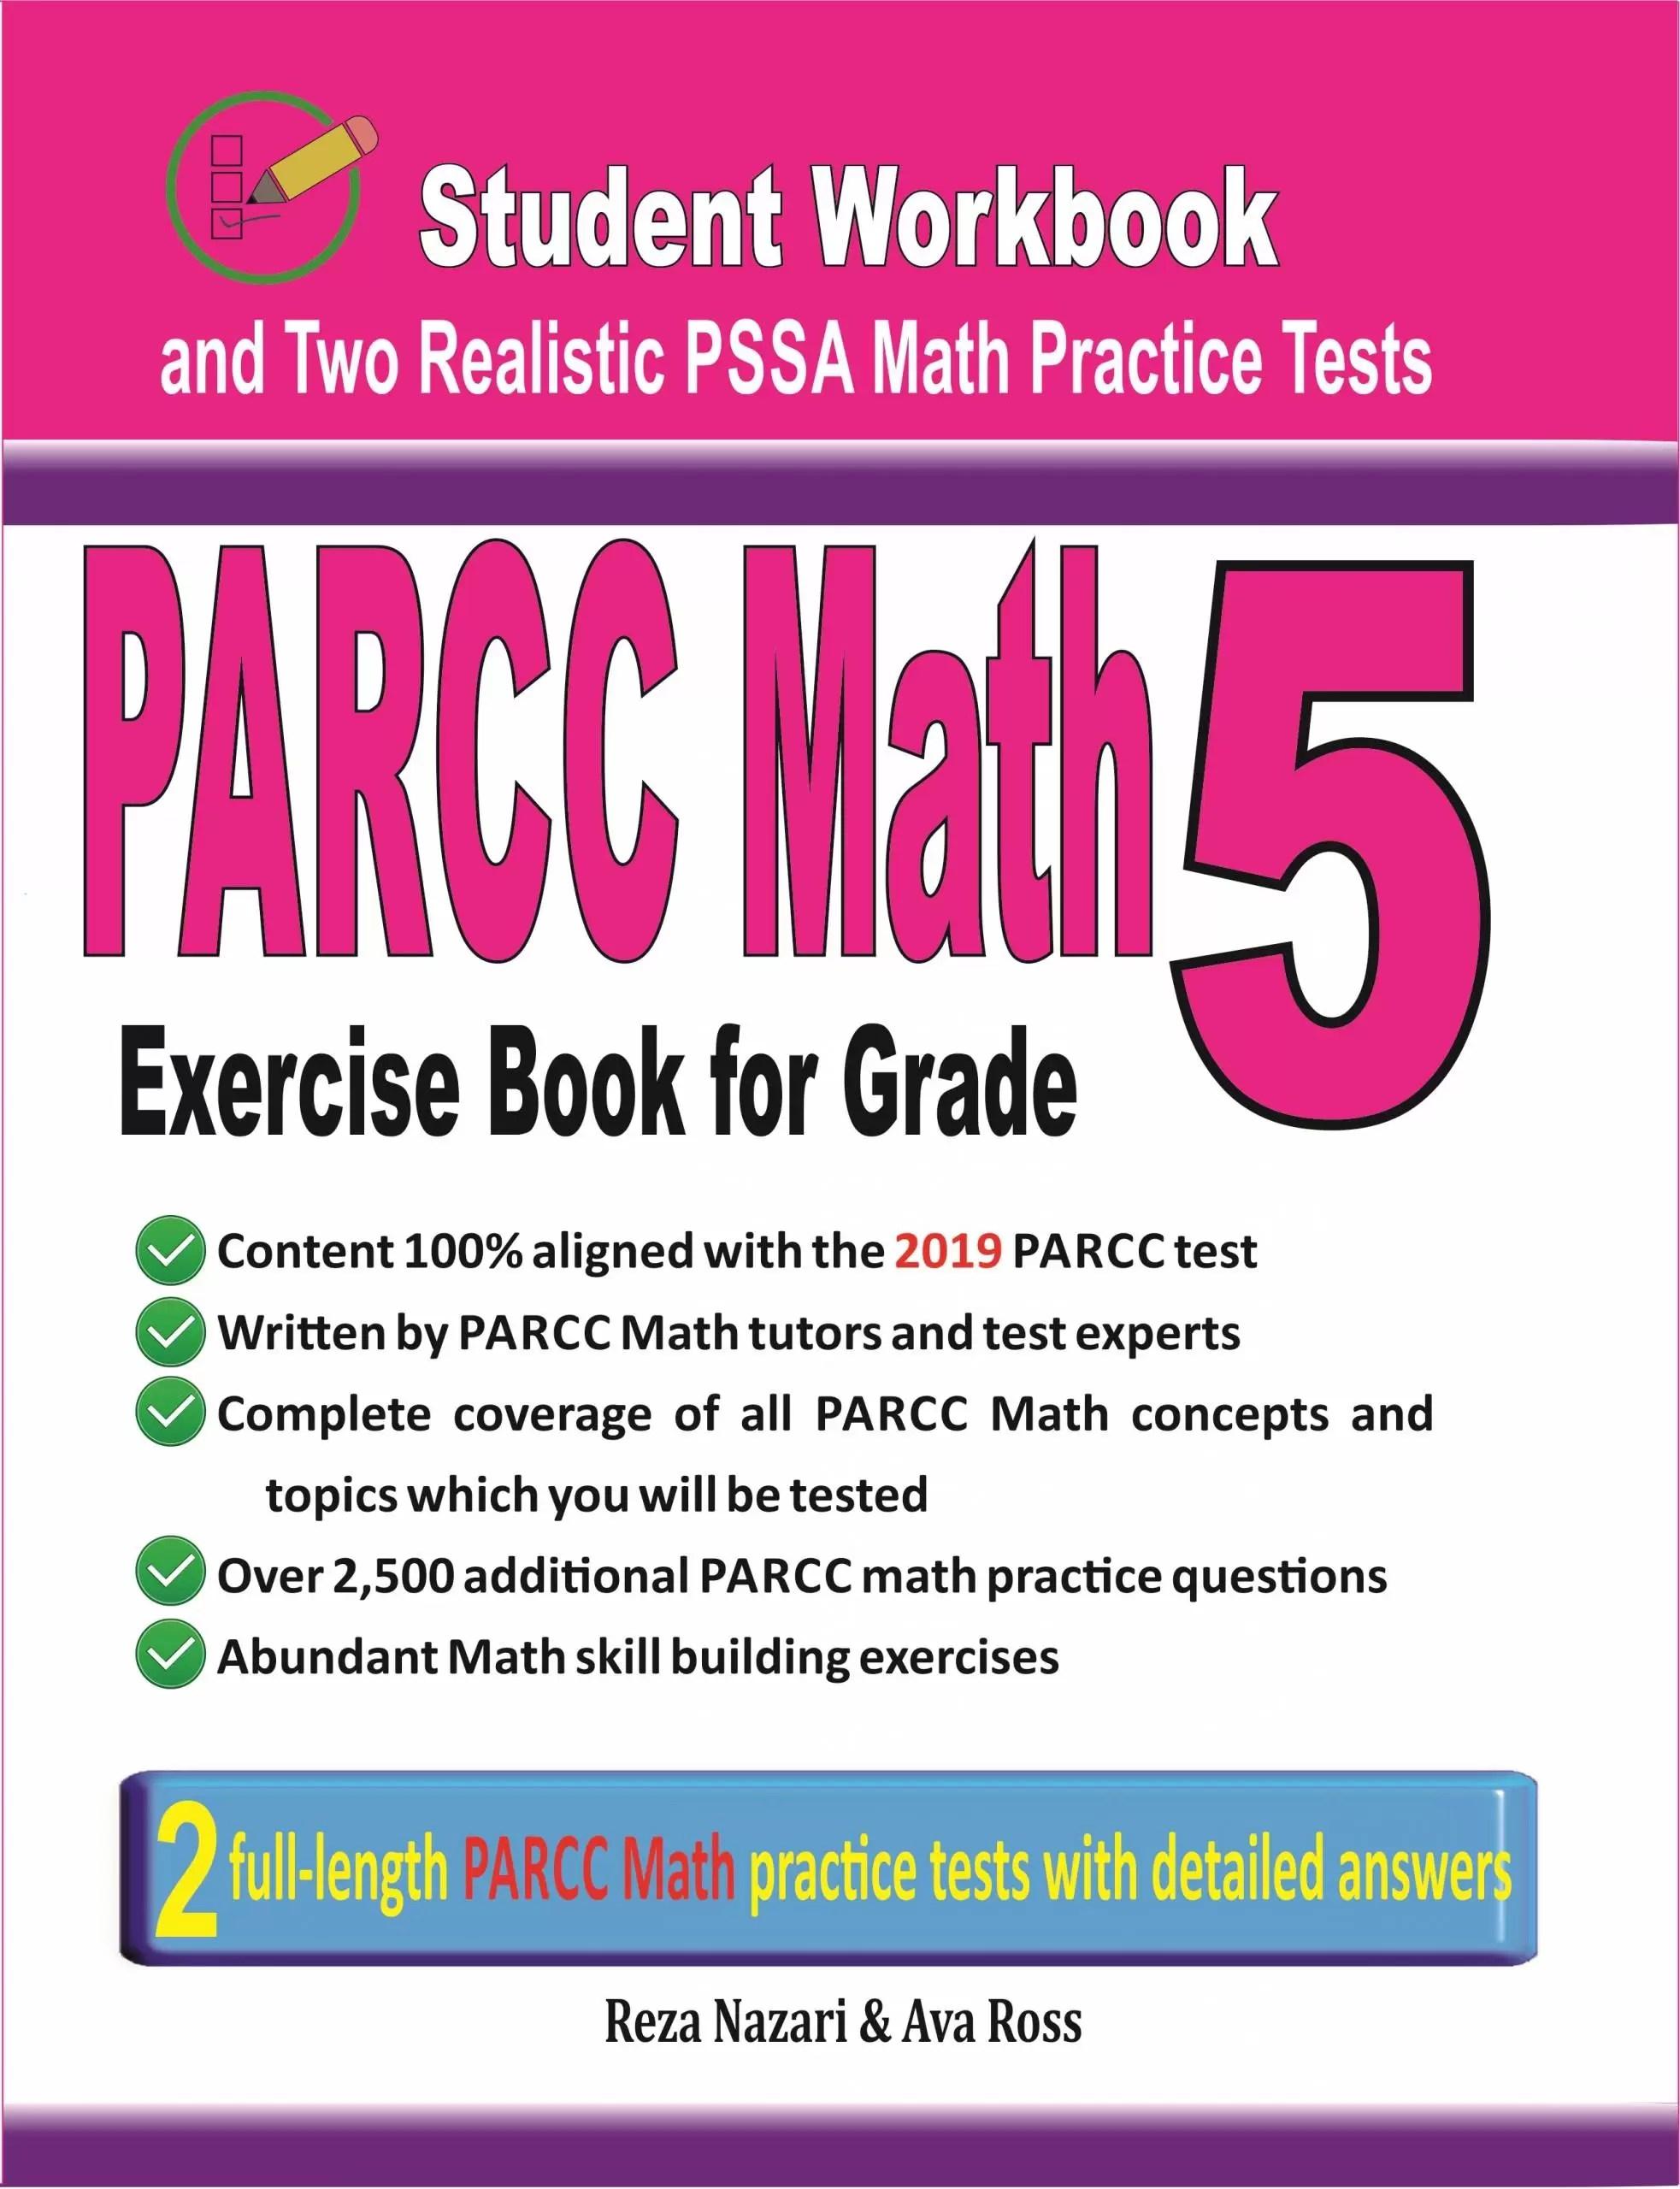 hight resolution of Grade 5 PARCC Math Worksheets - Effortless Math